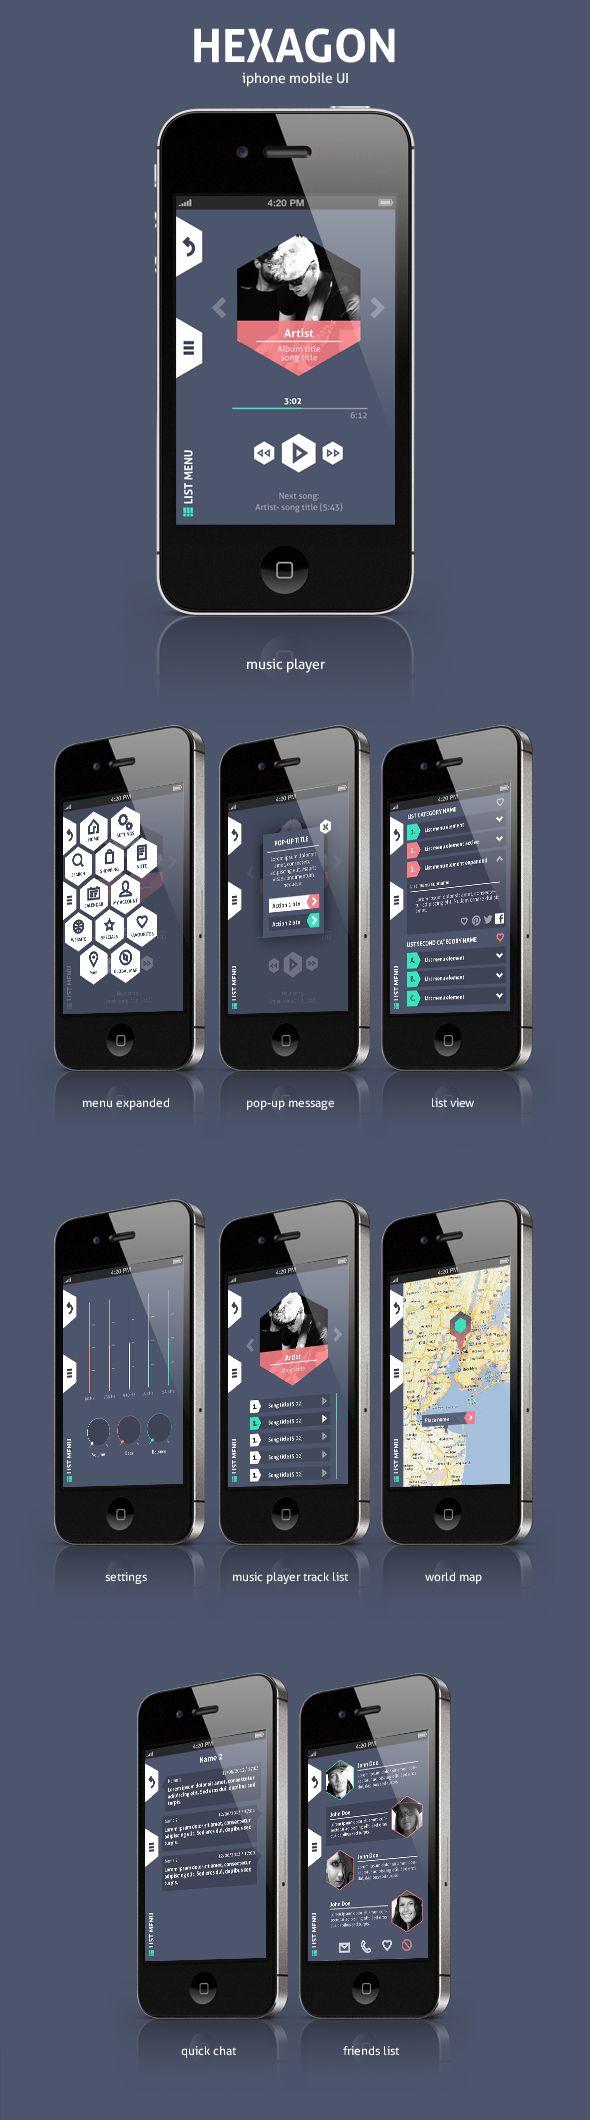 Hexagon UI for iPhone by azariel87 on deviantART